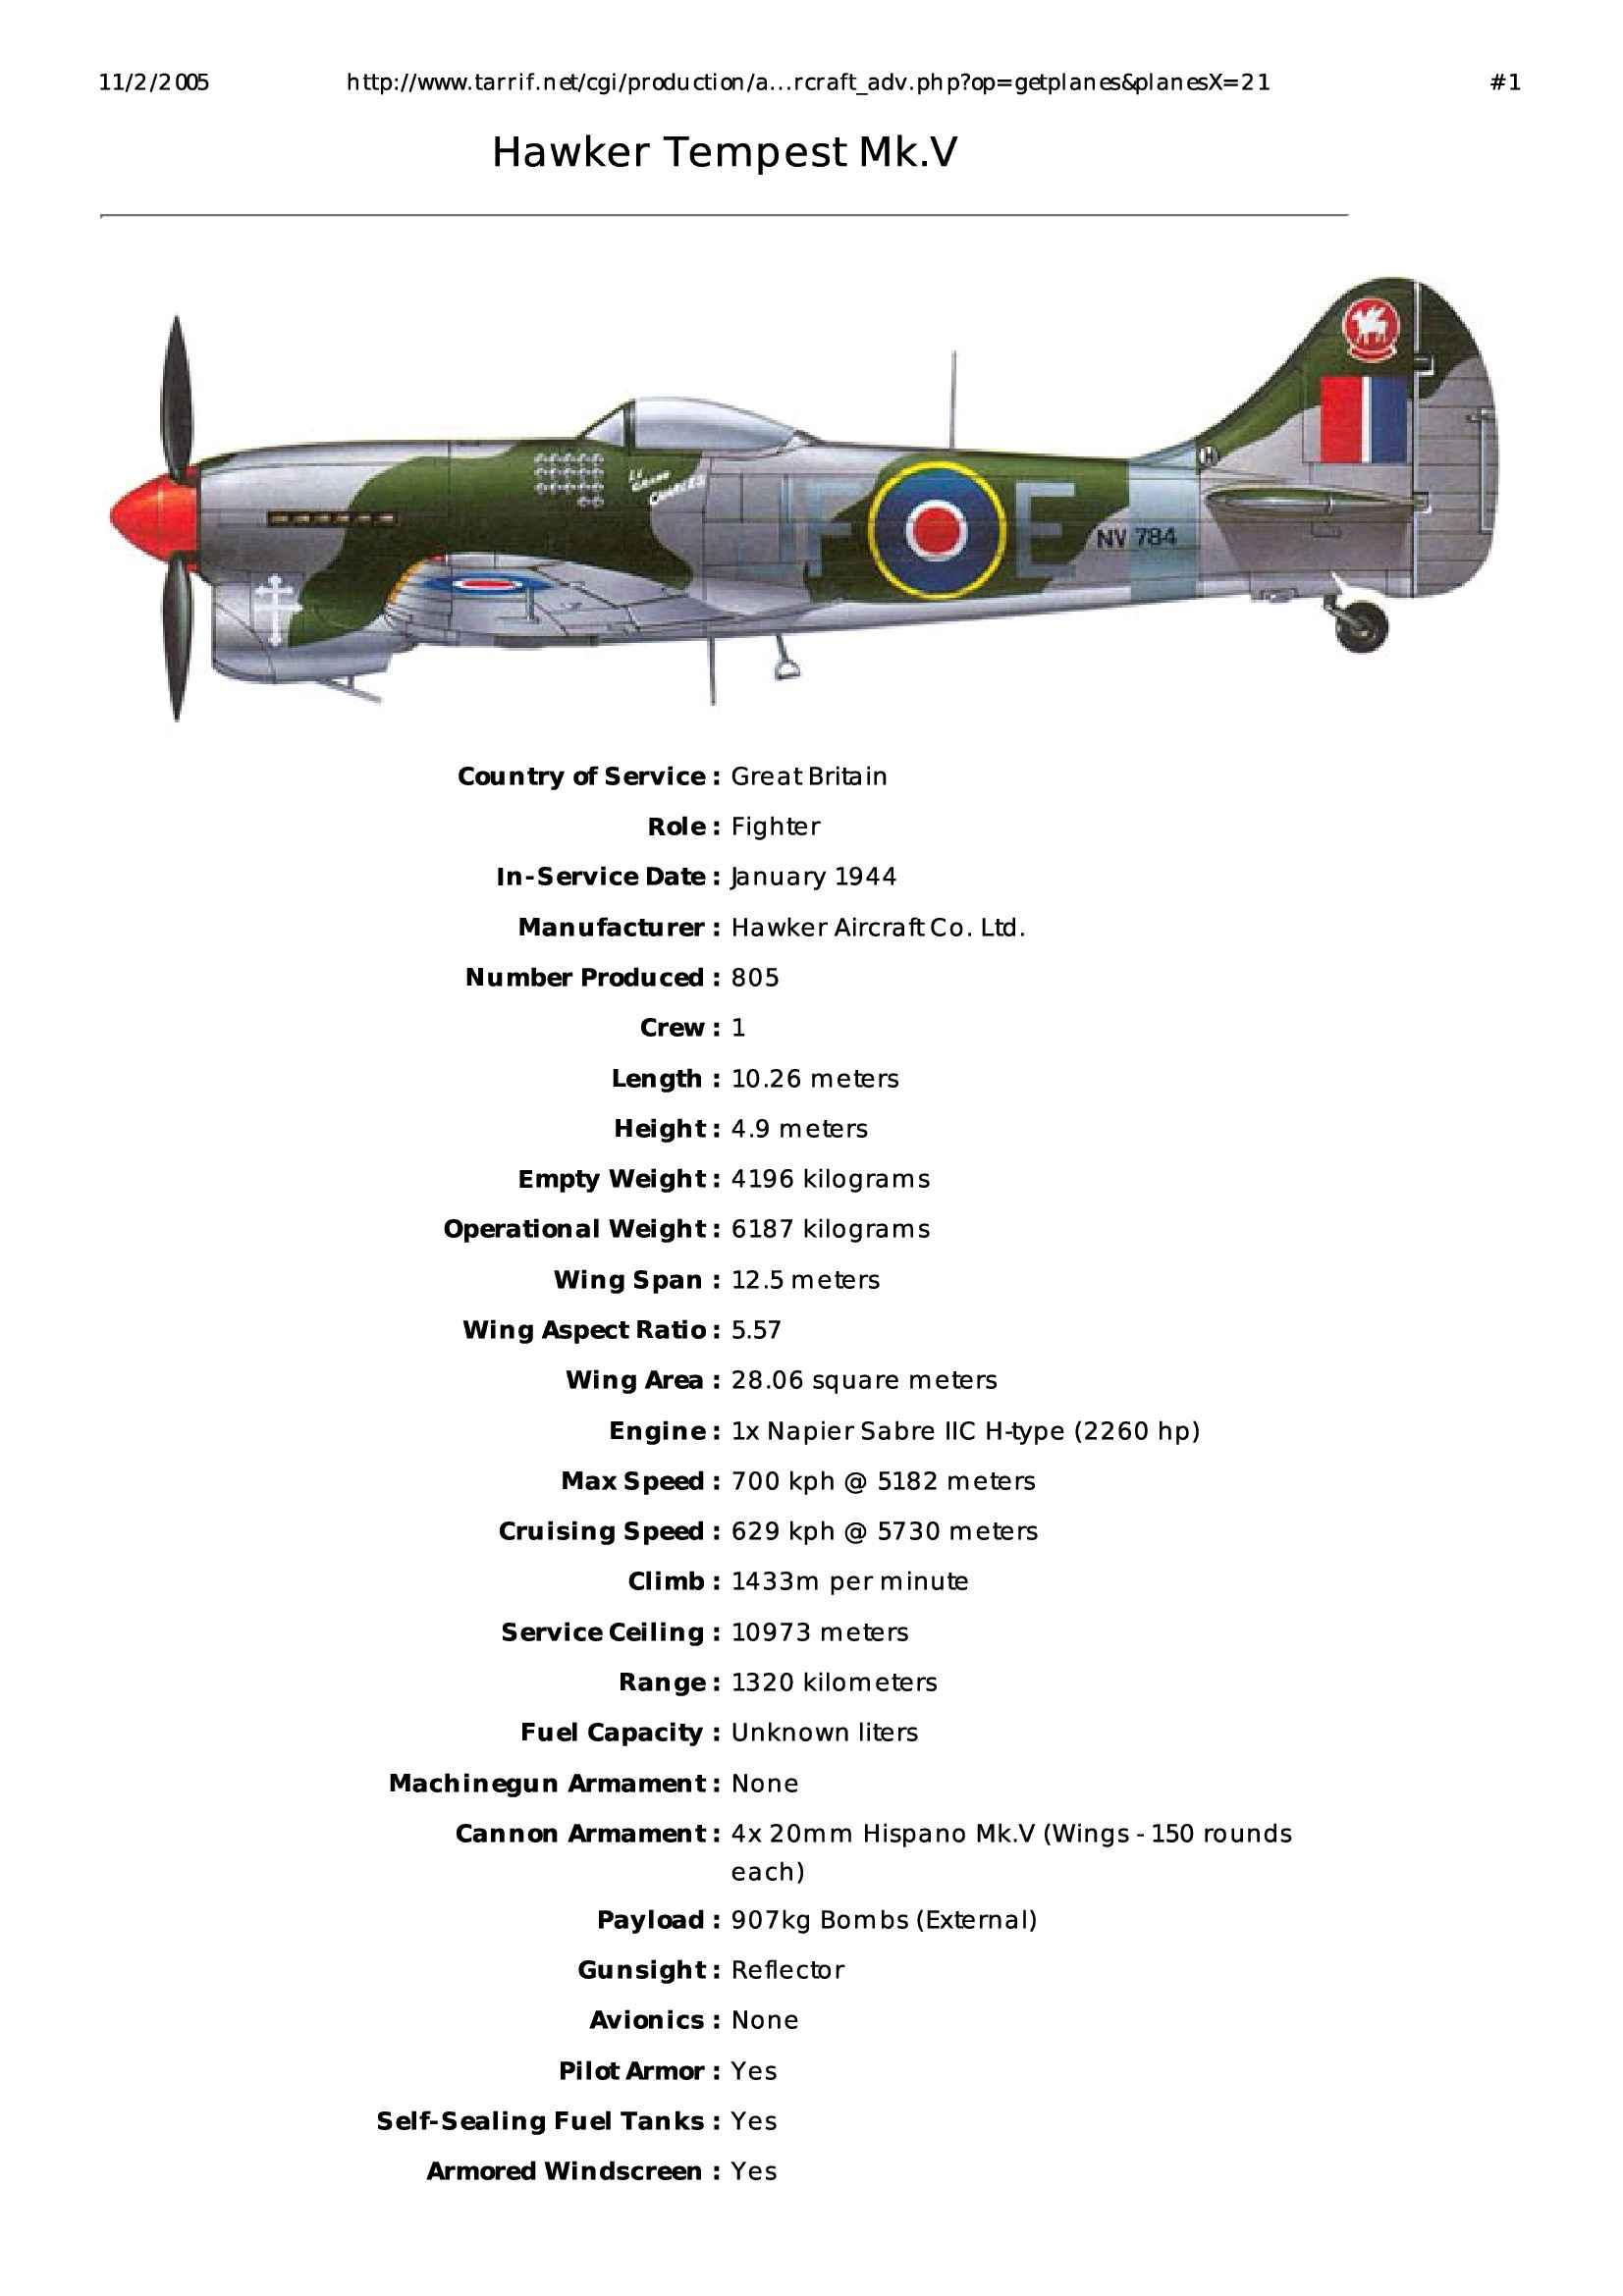 Hawker Tempest Mk.V - Scheda tecnica